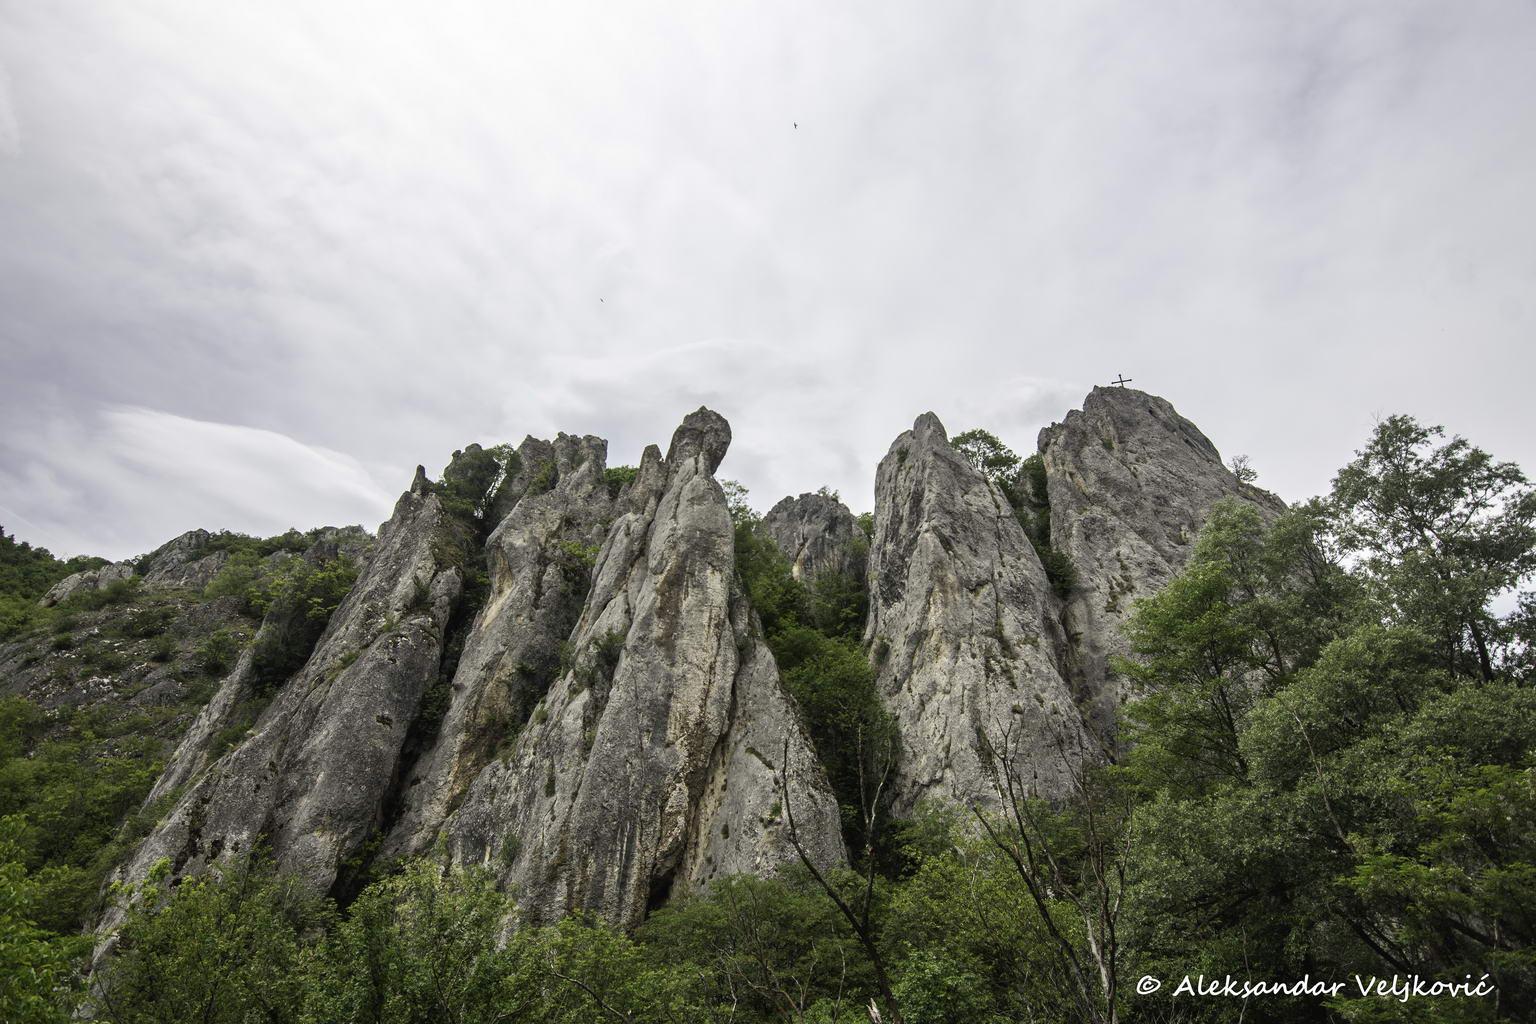 Cliffs of the Ždrelo gorge